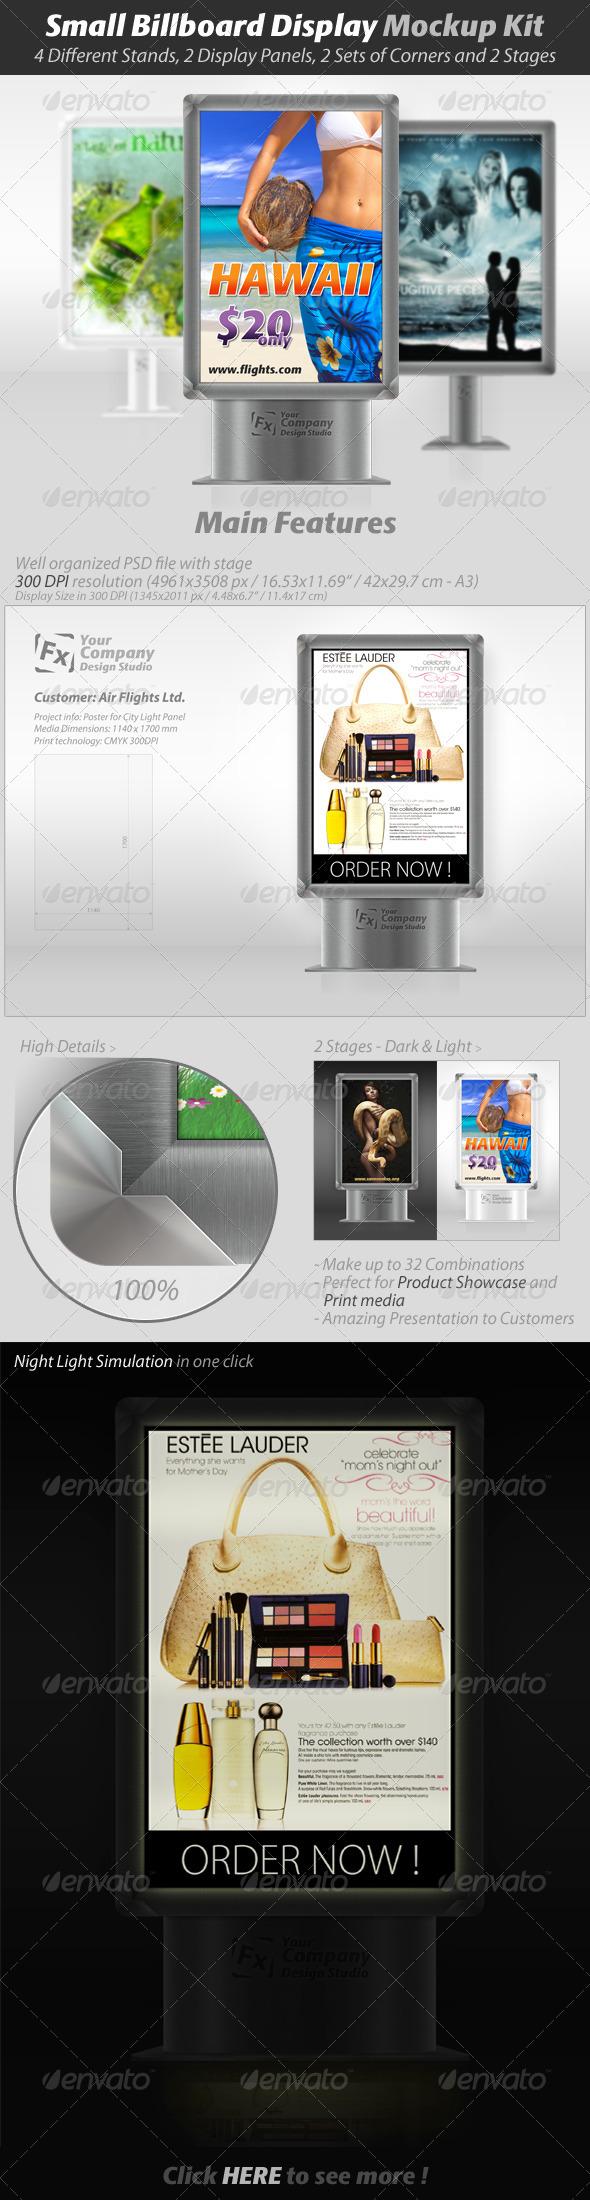 GraphicRiver Small Billboard Display Mockup Kit 325300